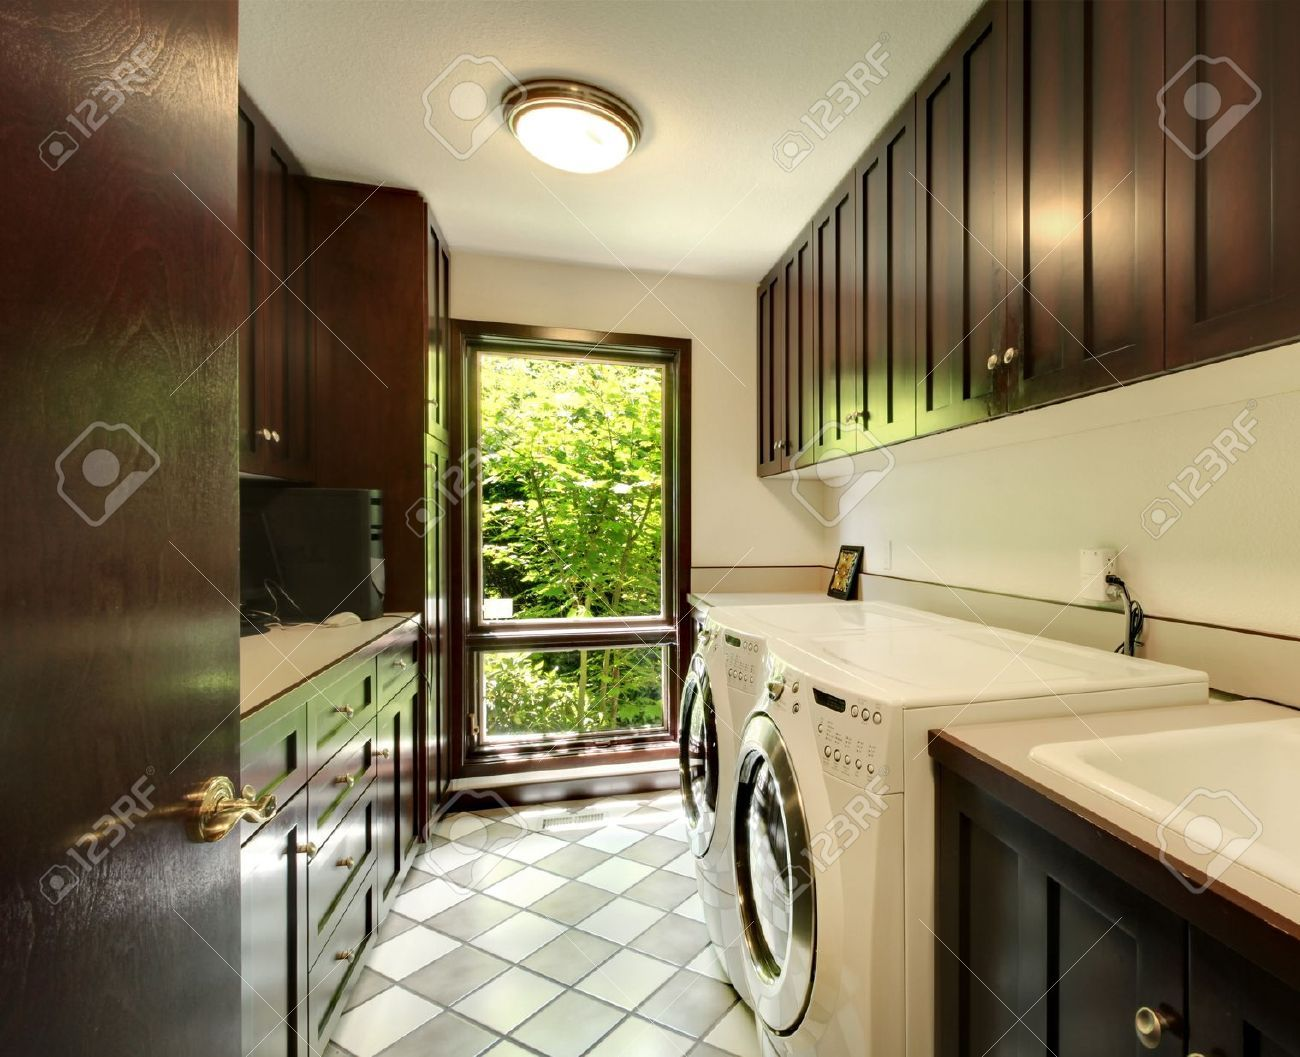 「洗濯室」の画像検索結果